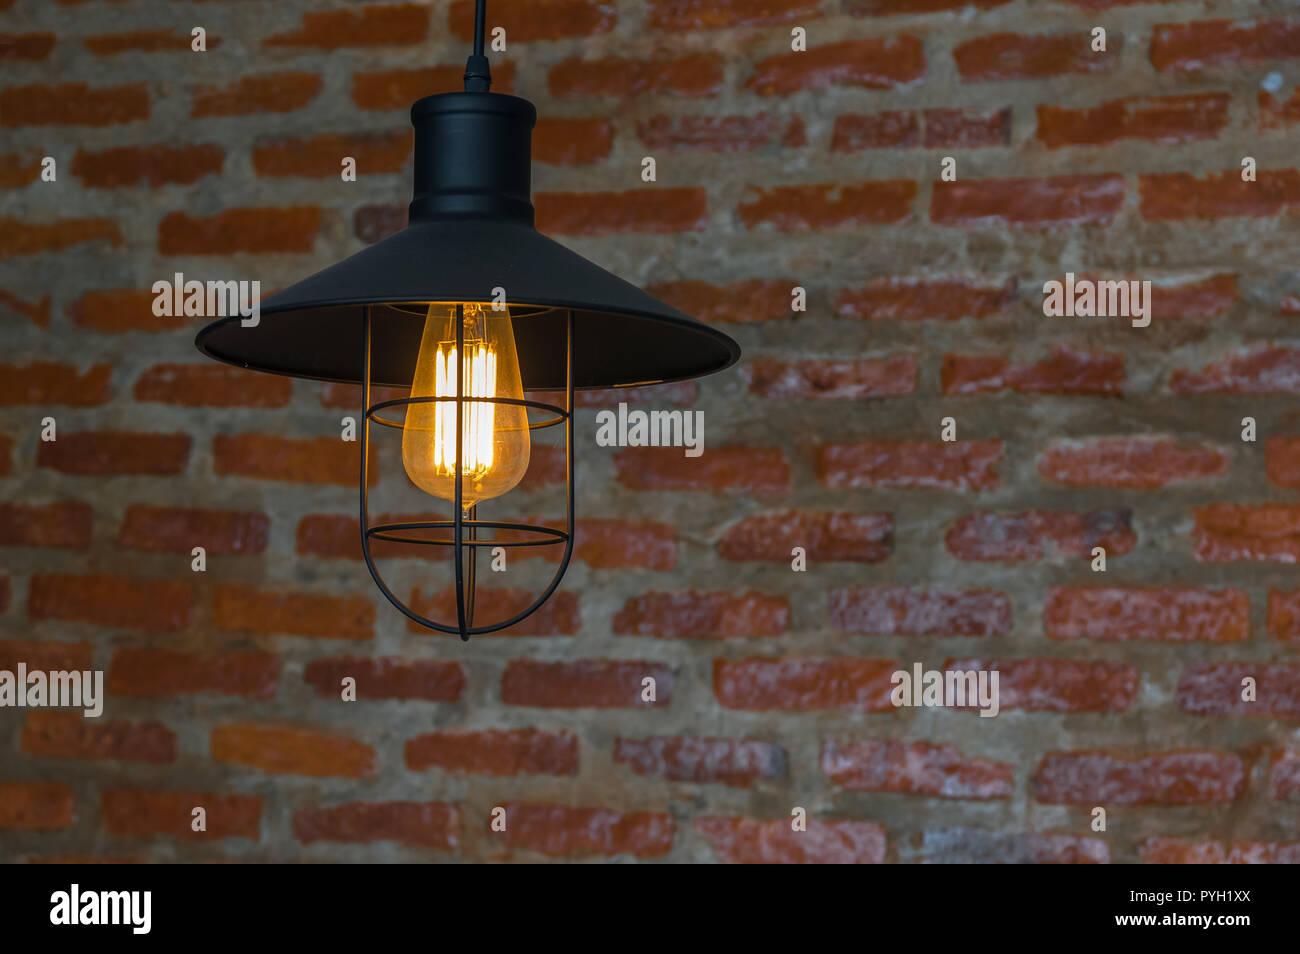 Luxury lighting decoration over the brick wall background Stock Photo